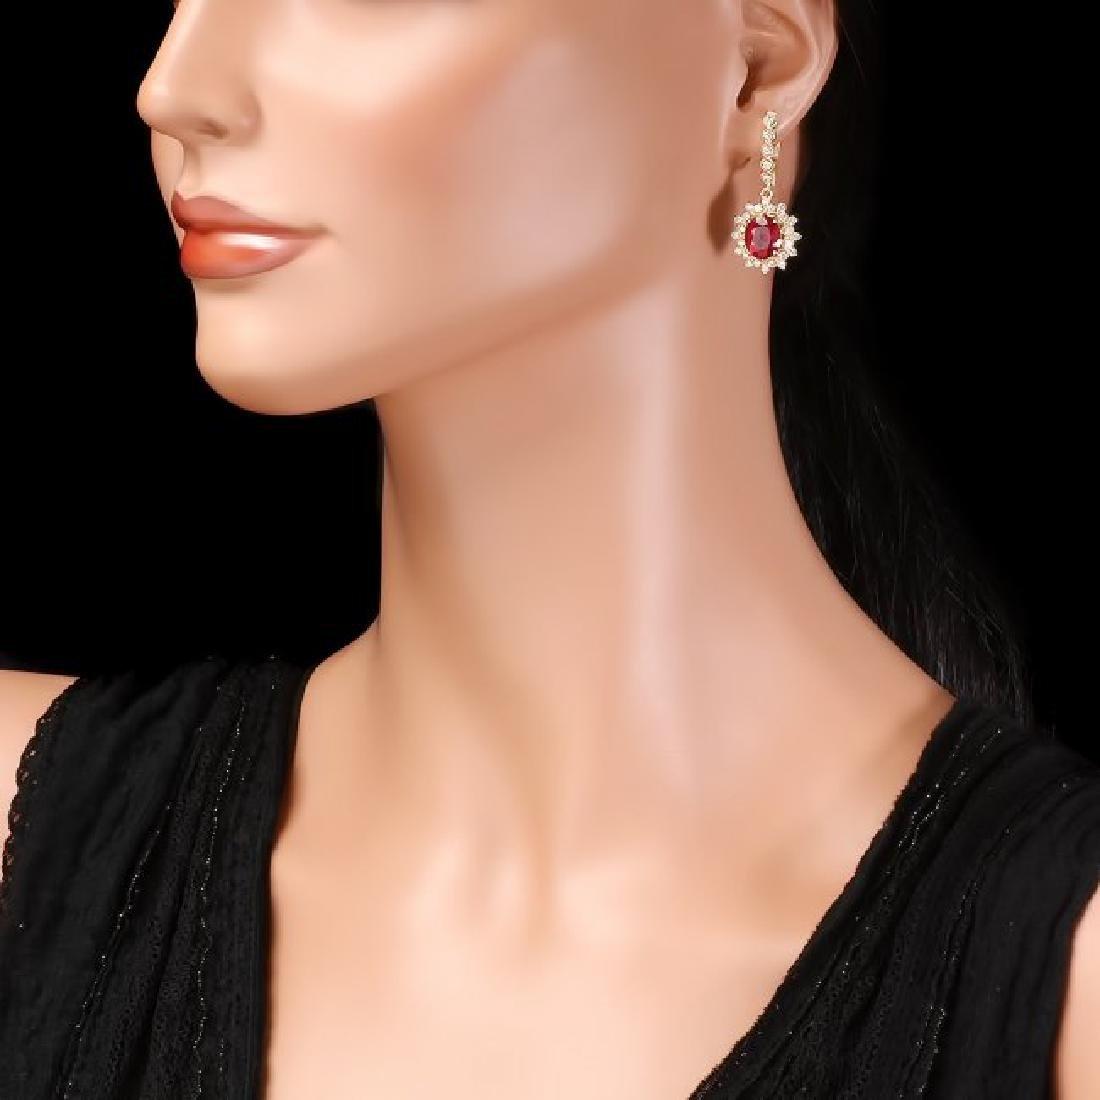 14k Gold 7.00ct Ruby 1.70ct Diamond Earrings - 3